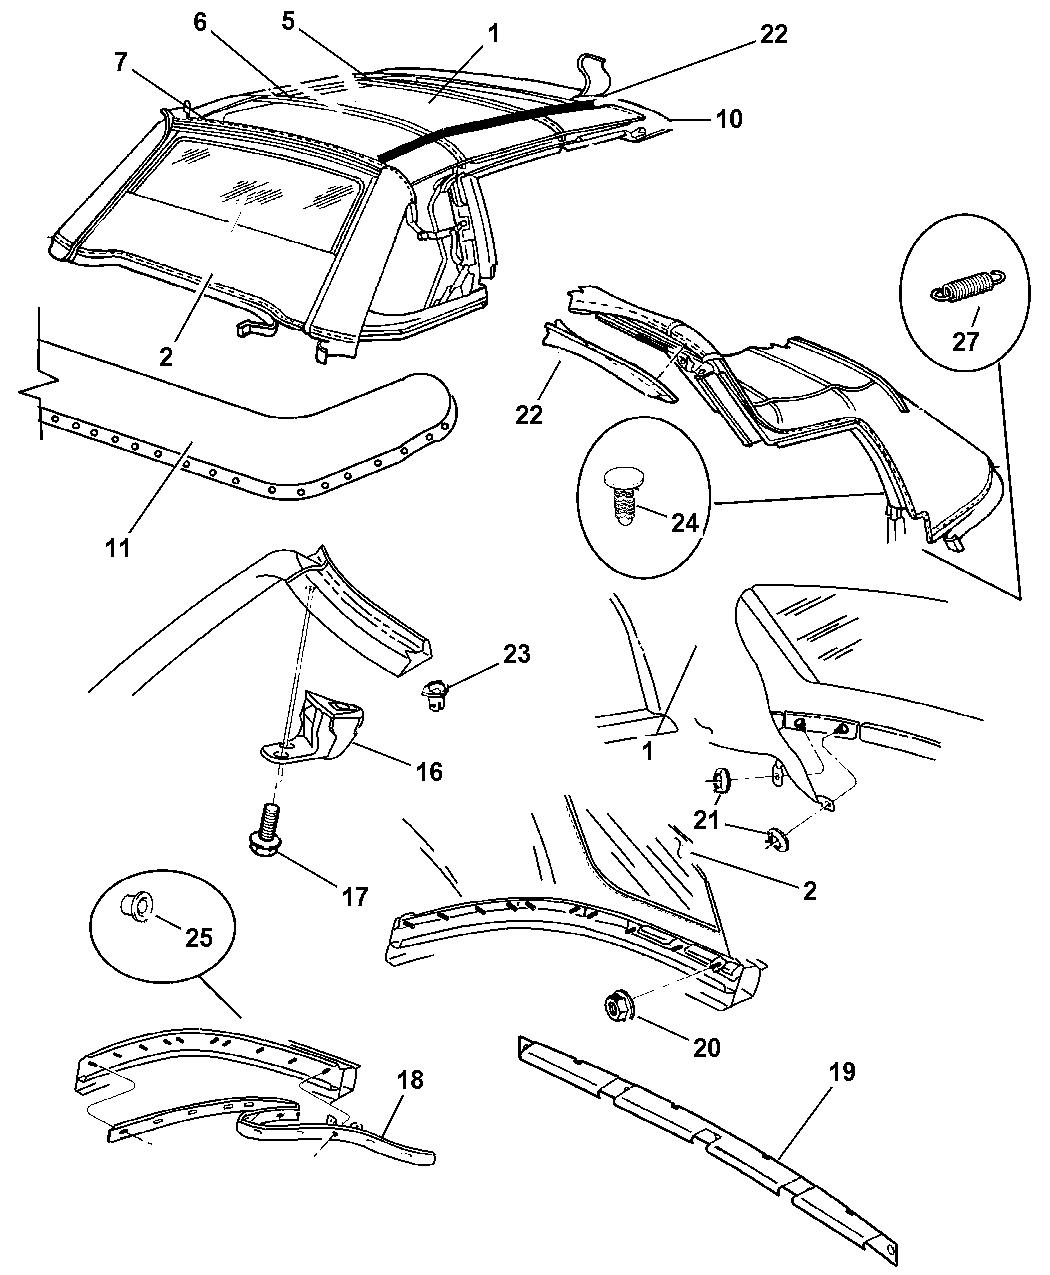 2004 chrysler sebring sedan convertible convertible top publicscrutiny Images